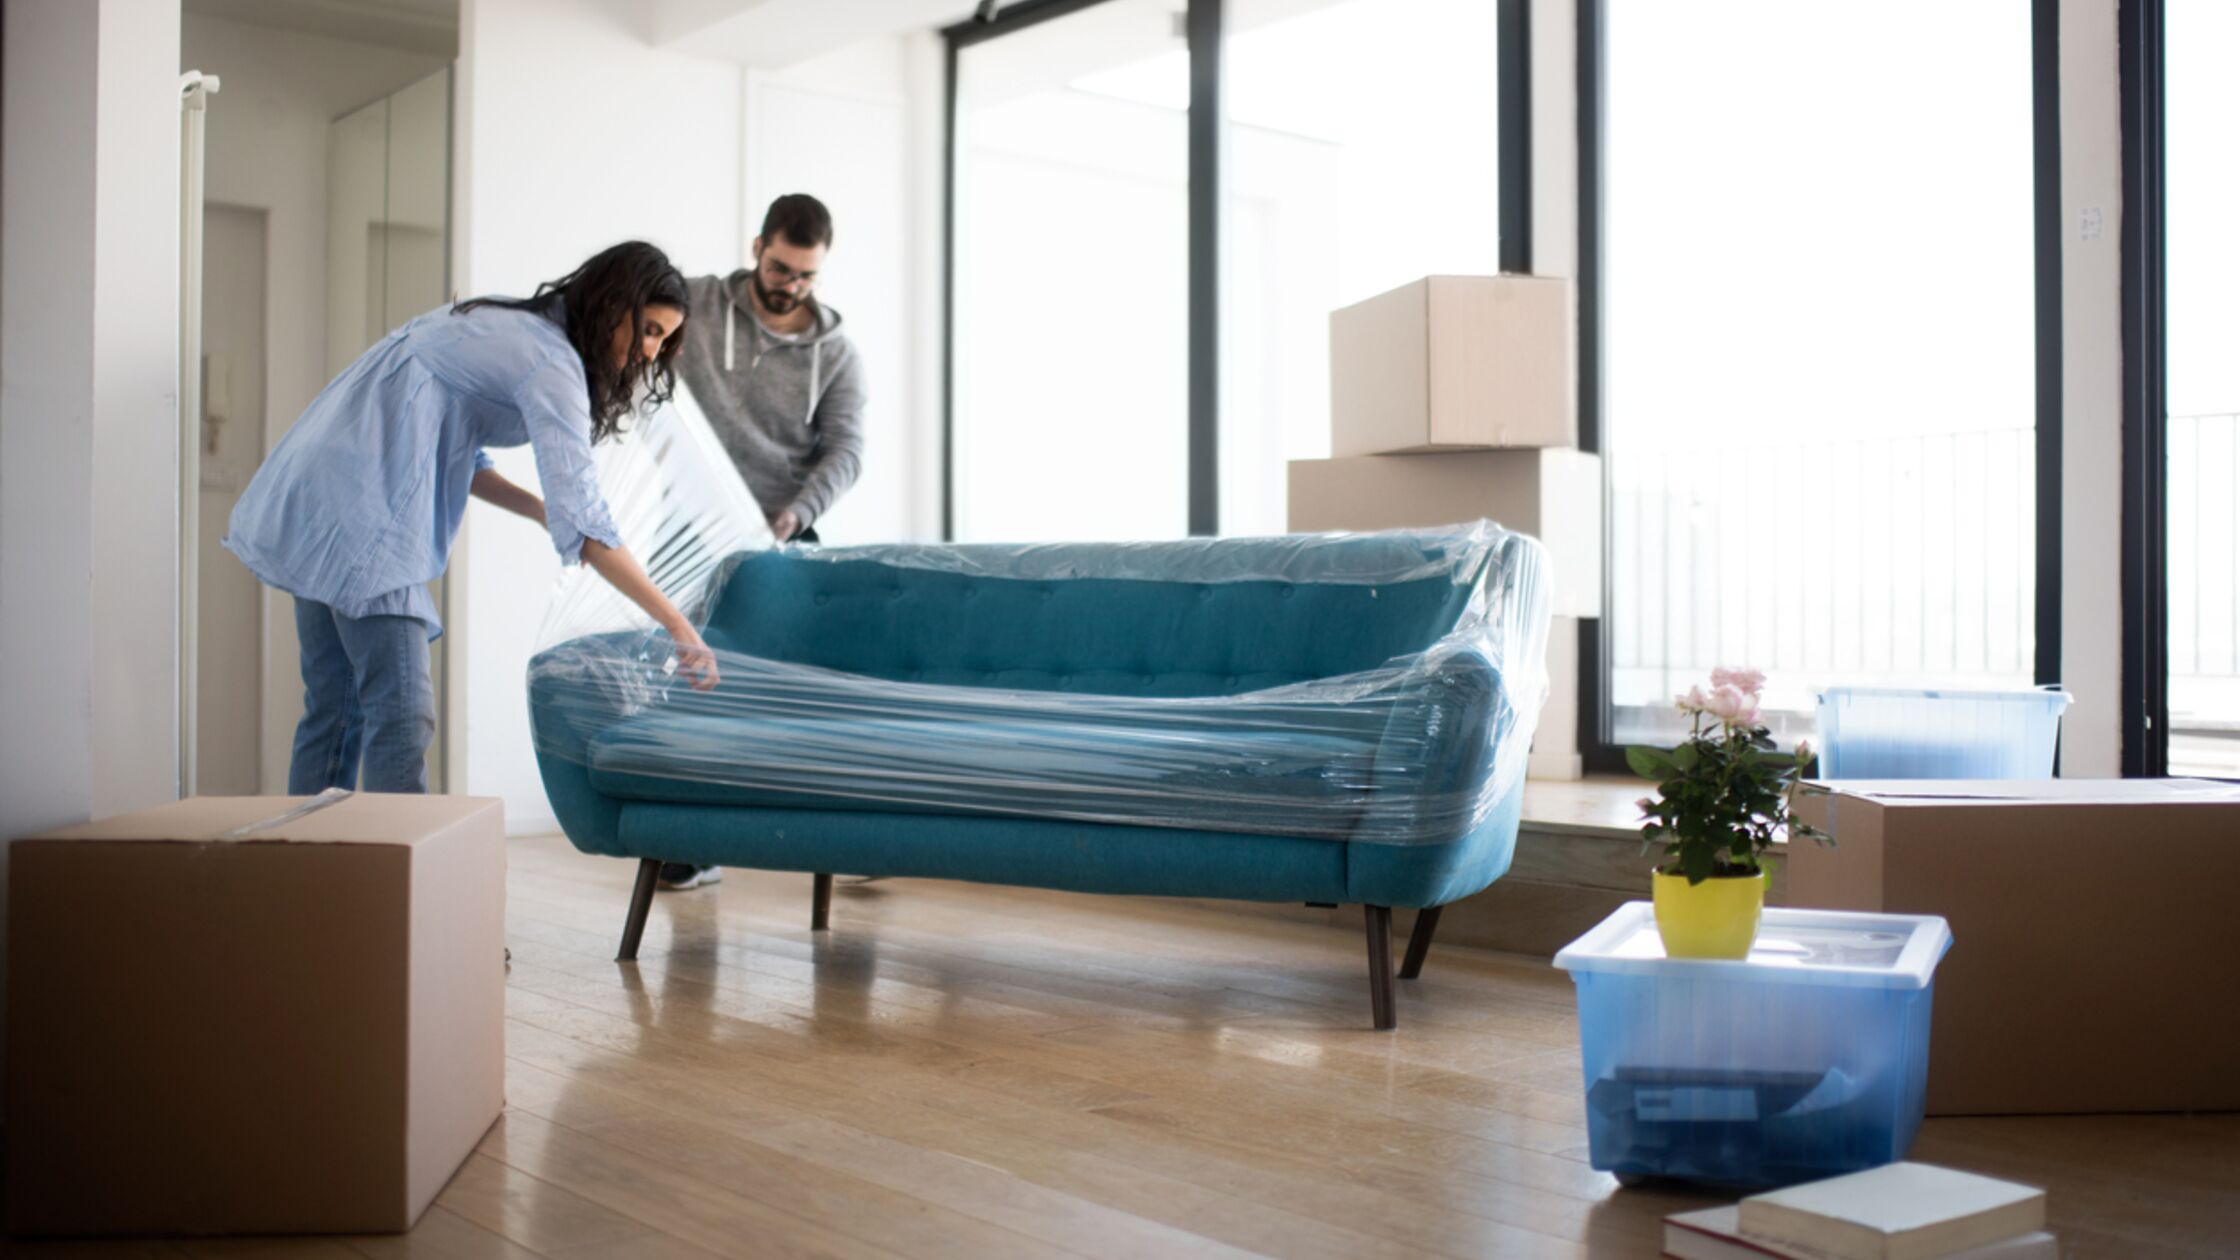 Paar wickelt Sofa in Stretchfolie